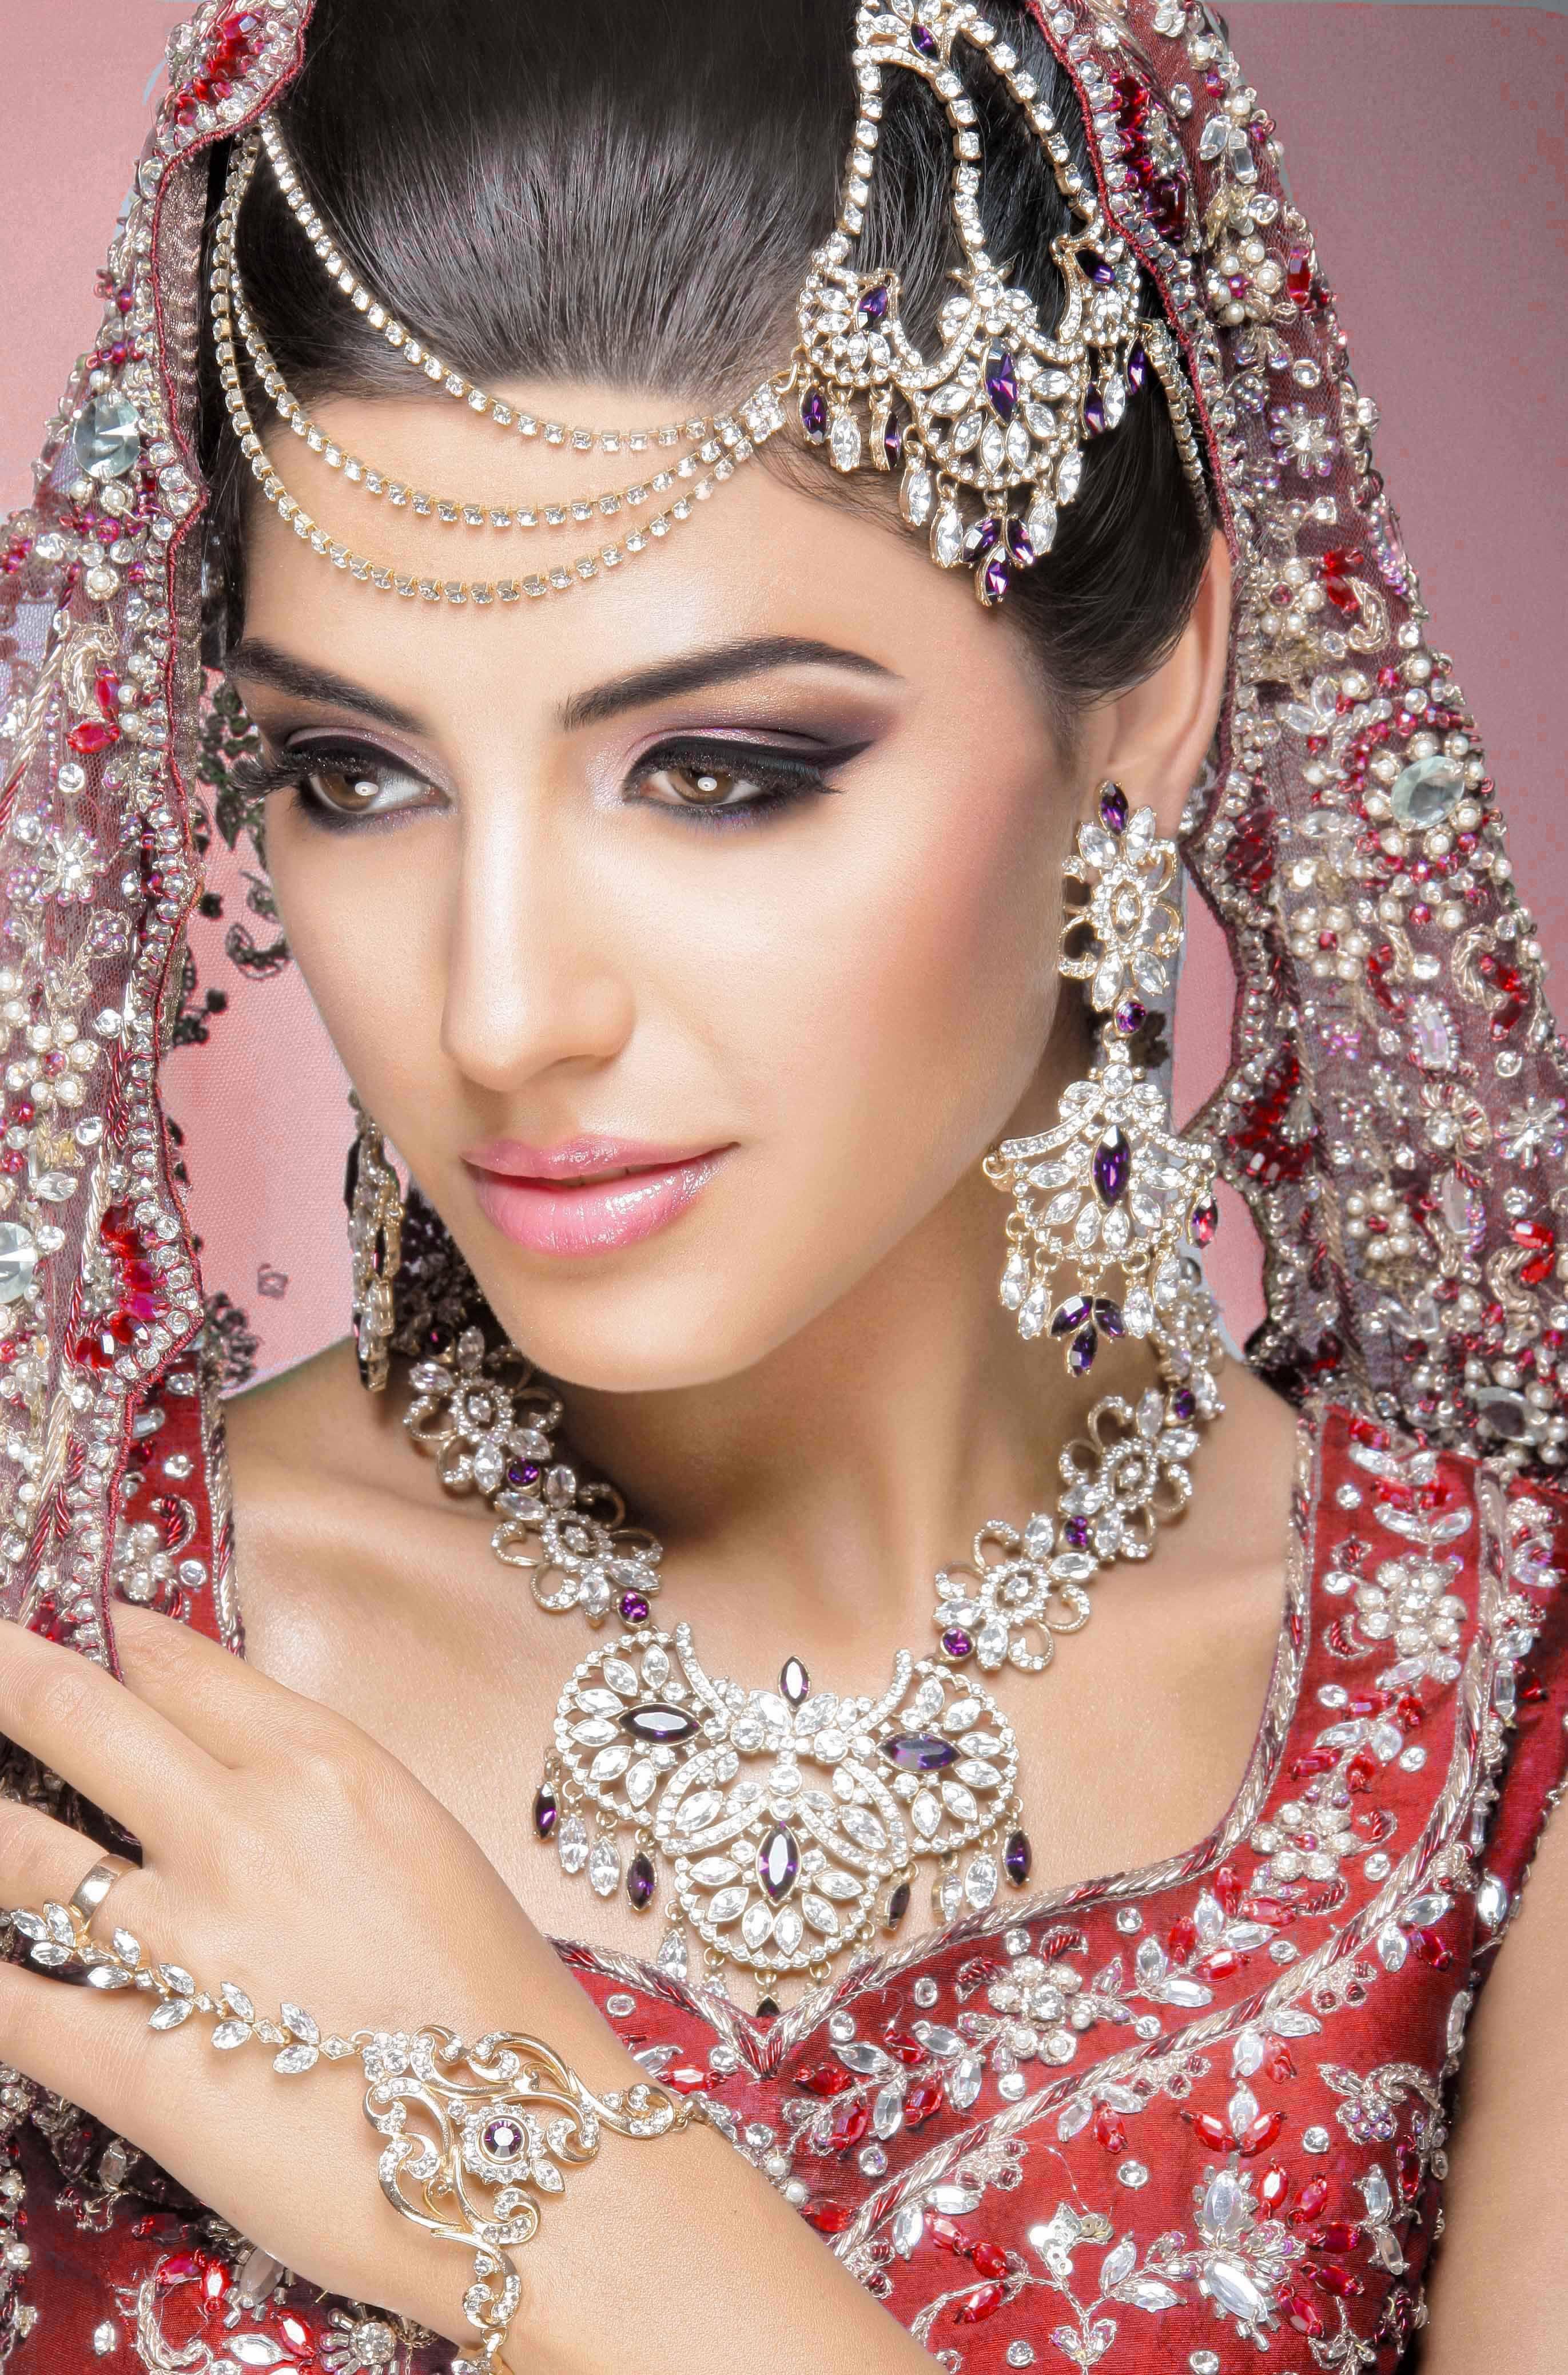 East Indian Bridal Makeup Hairdos Pinterest Indian bridal